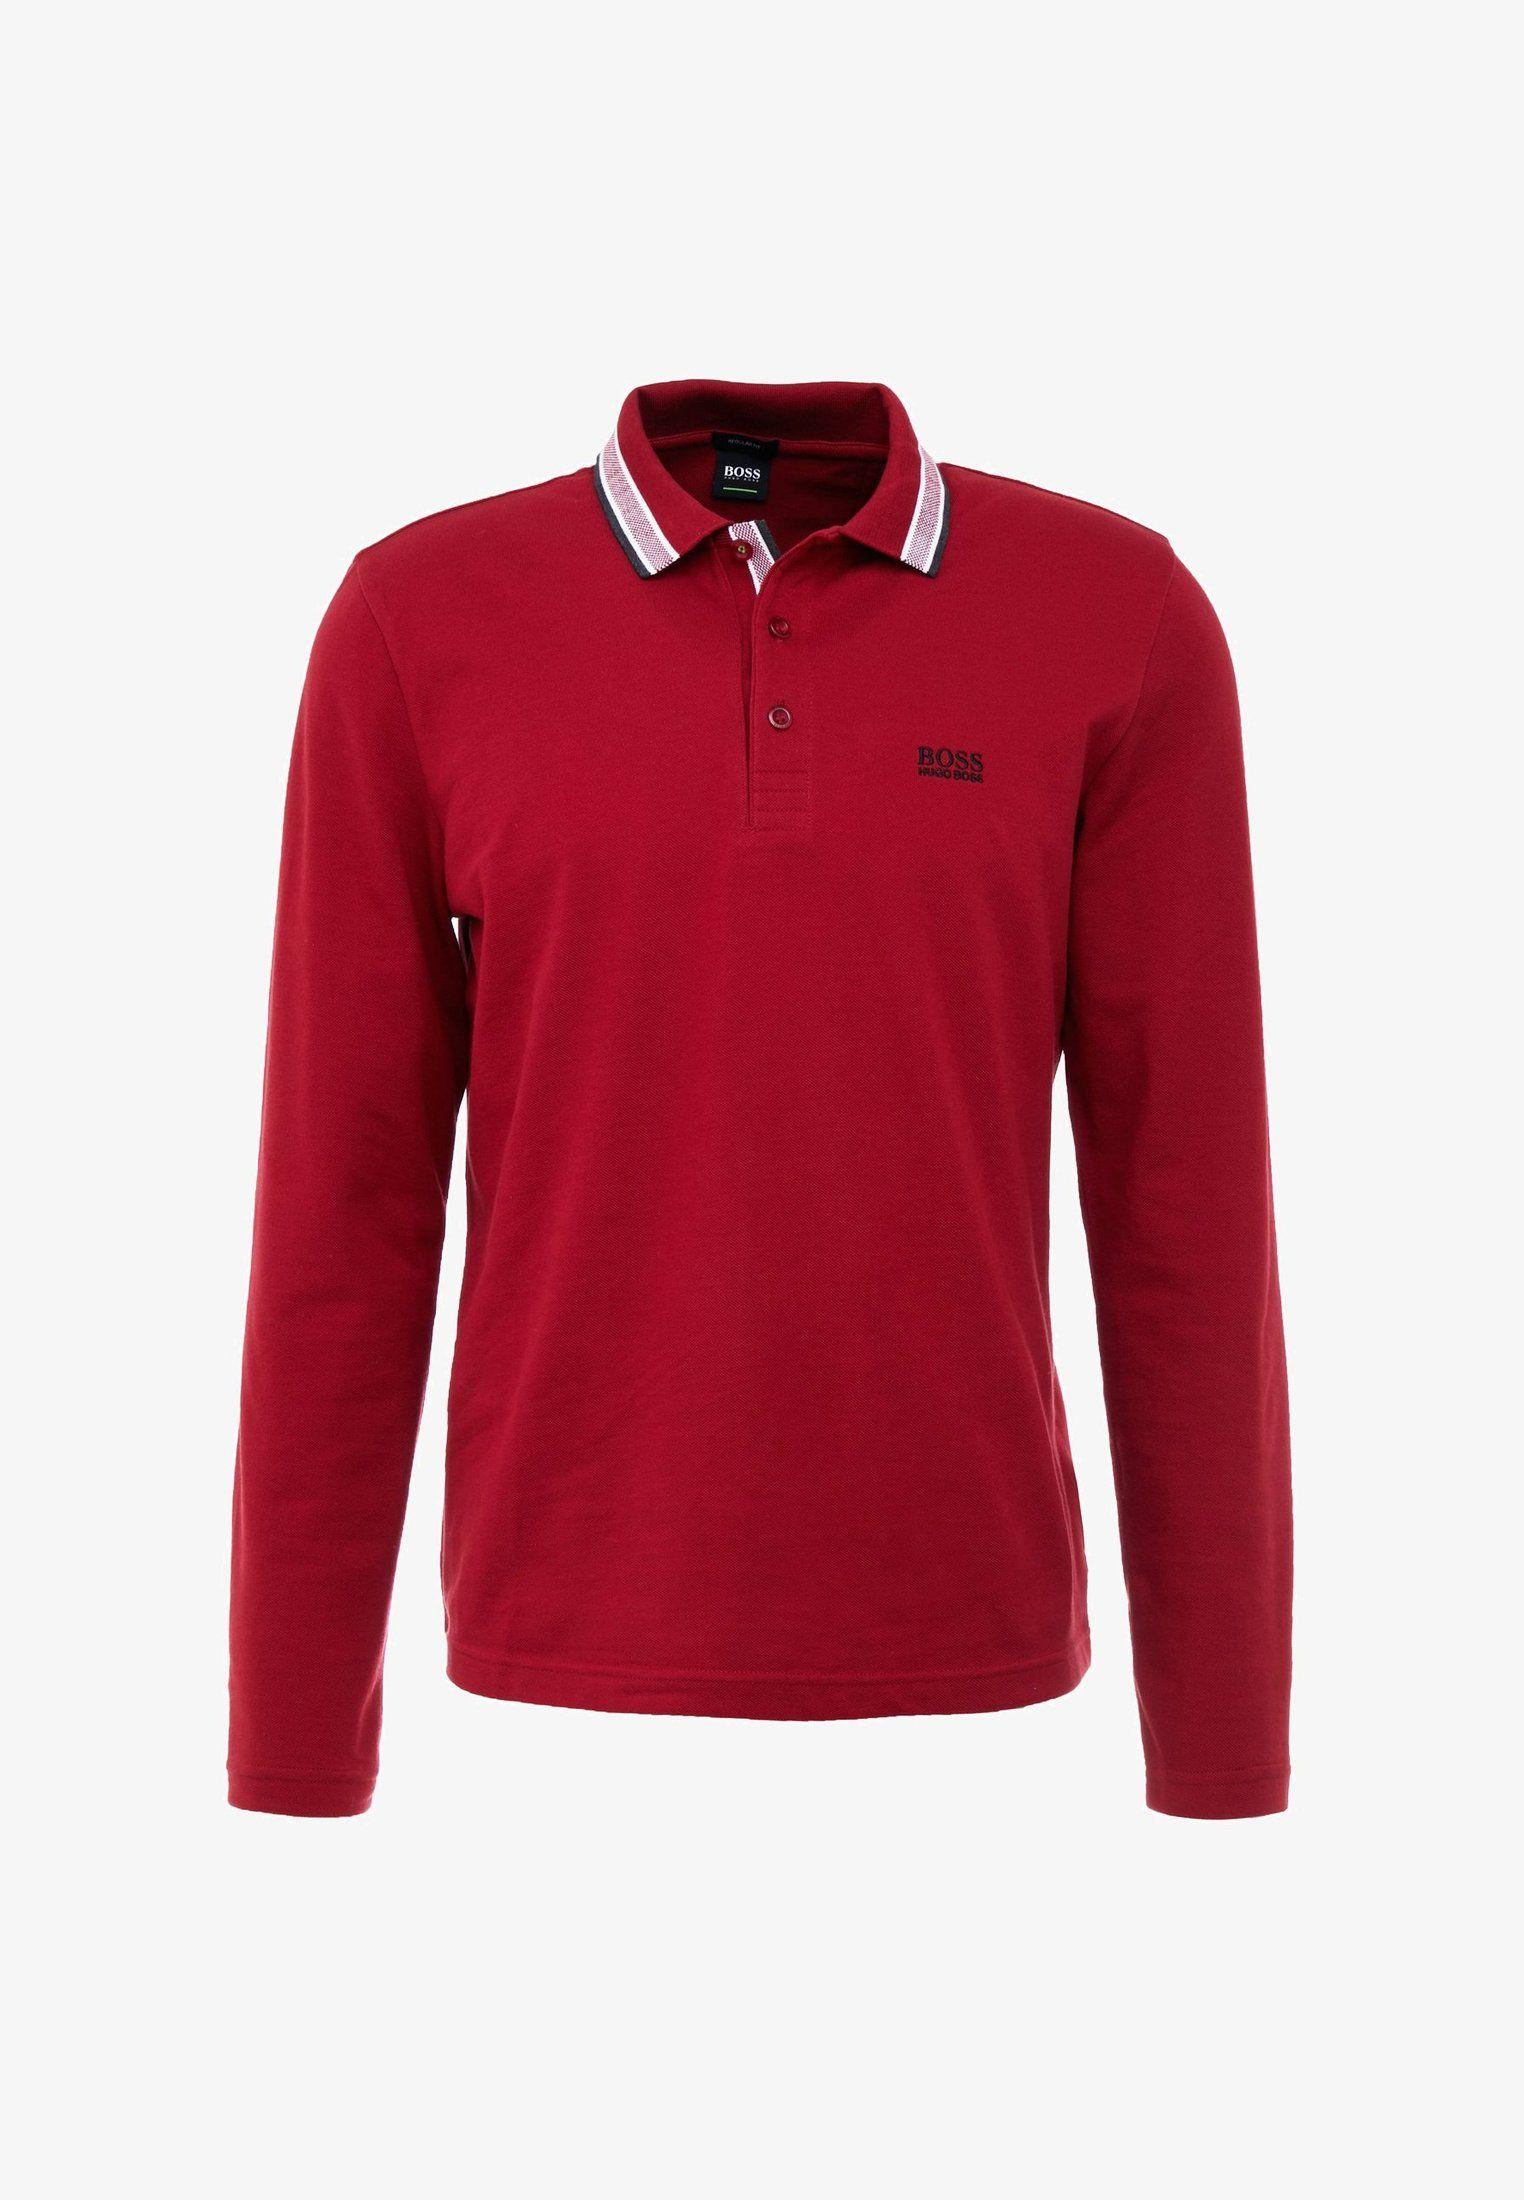 04891ee9 PLISY REGULAR FIT - Polo shirt - dark red @ Zalando.co.uk 🛒 de 2019 ...